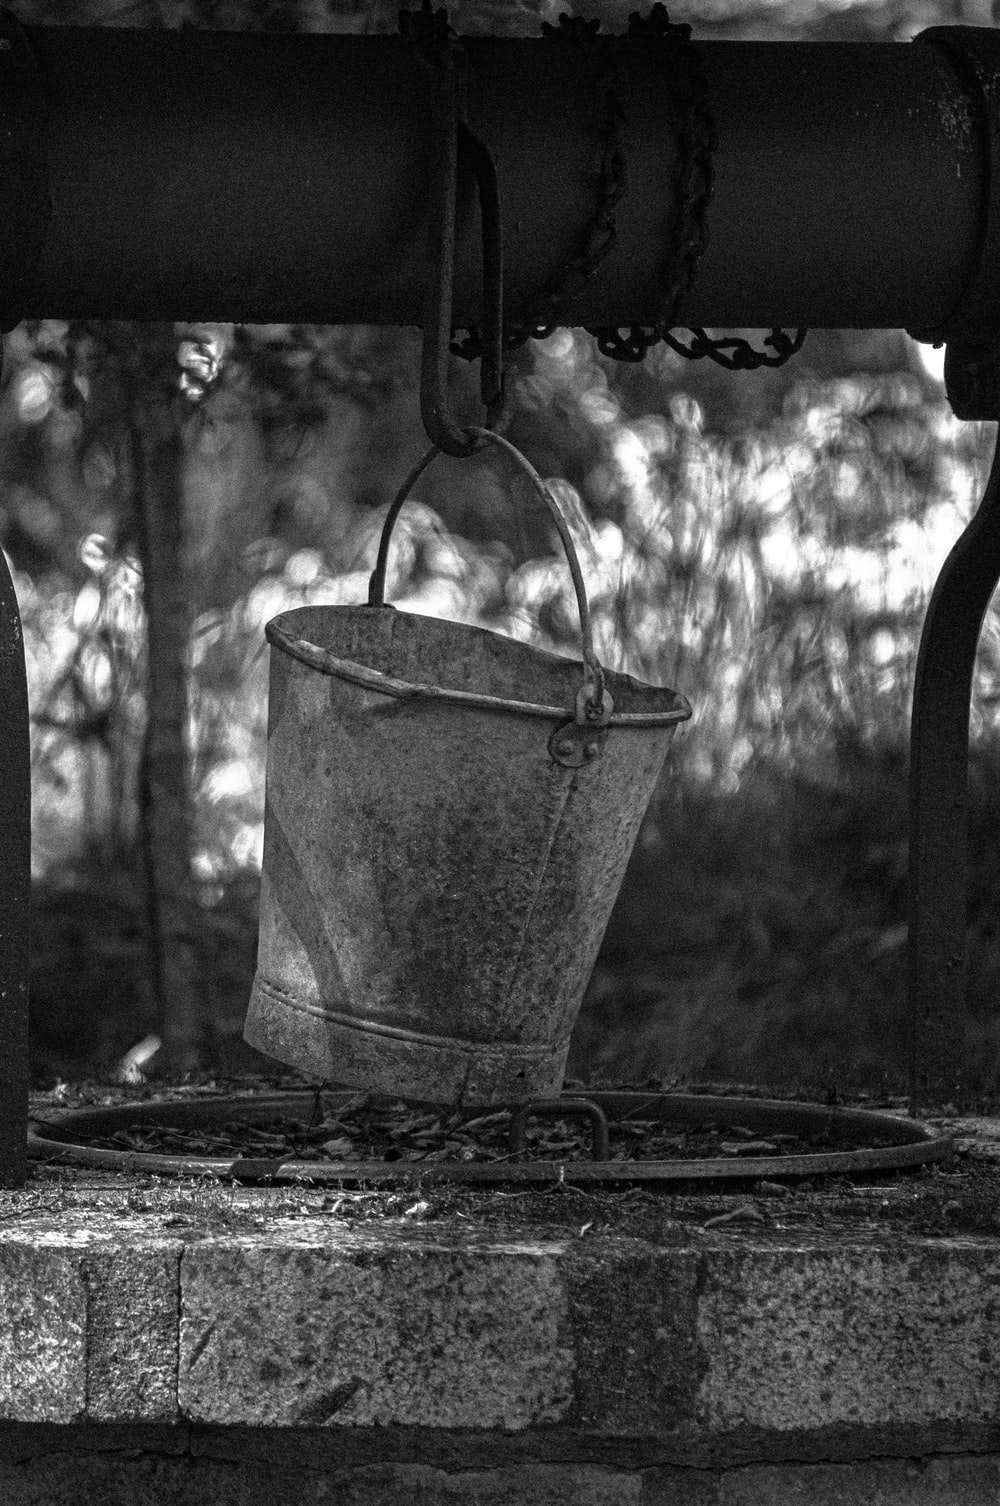 gray scale photo of bucket